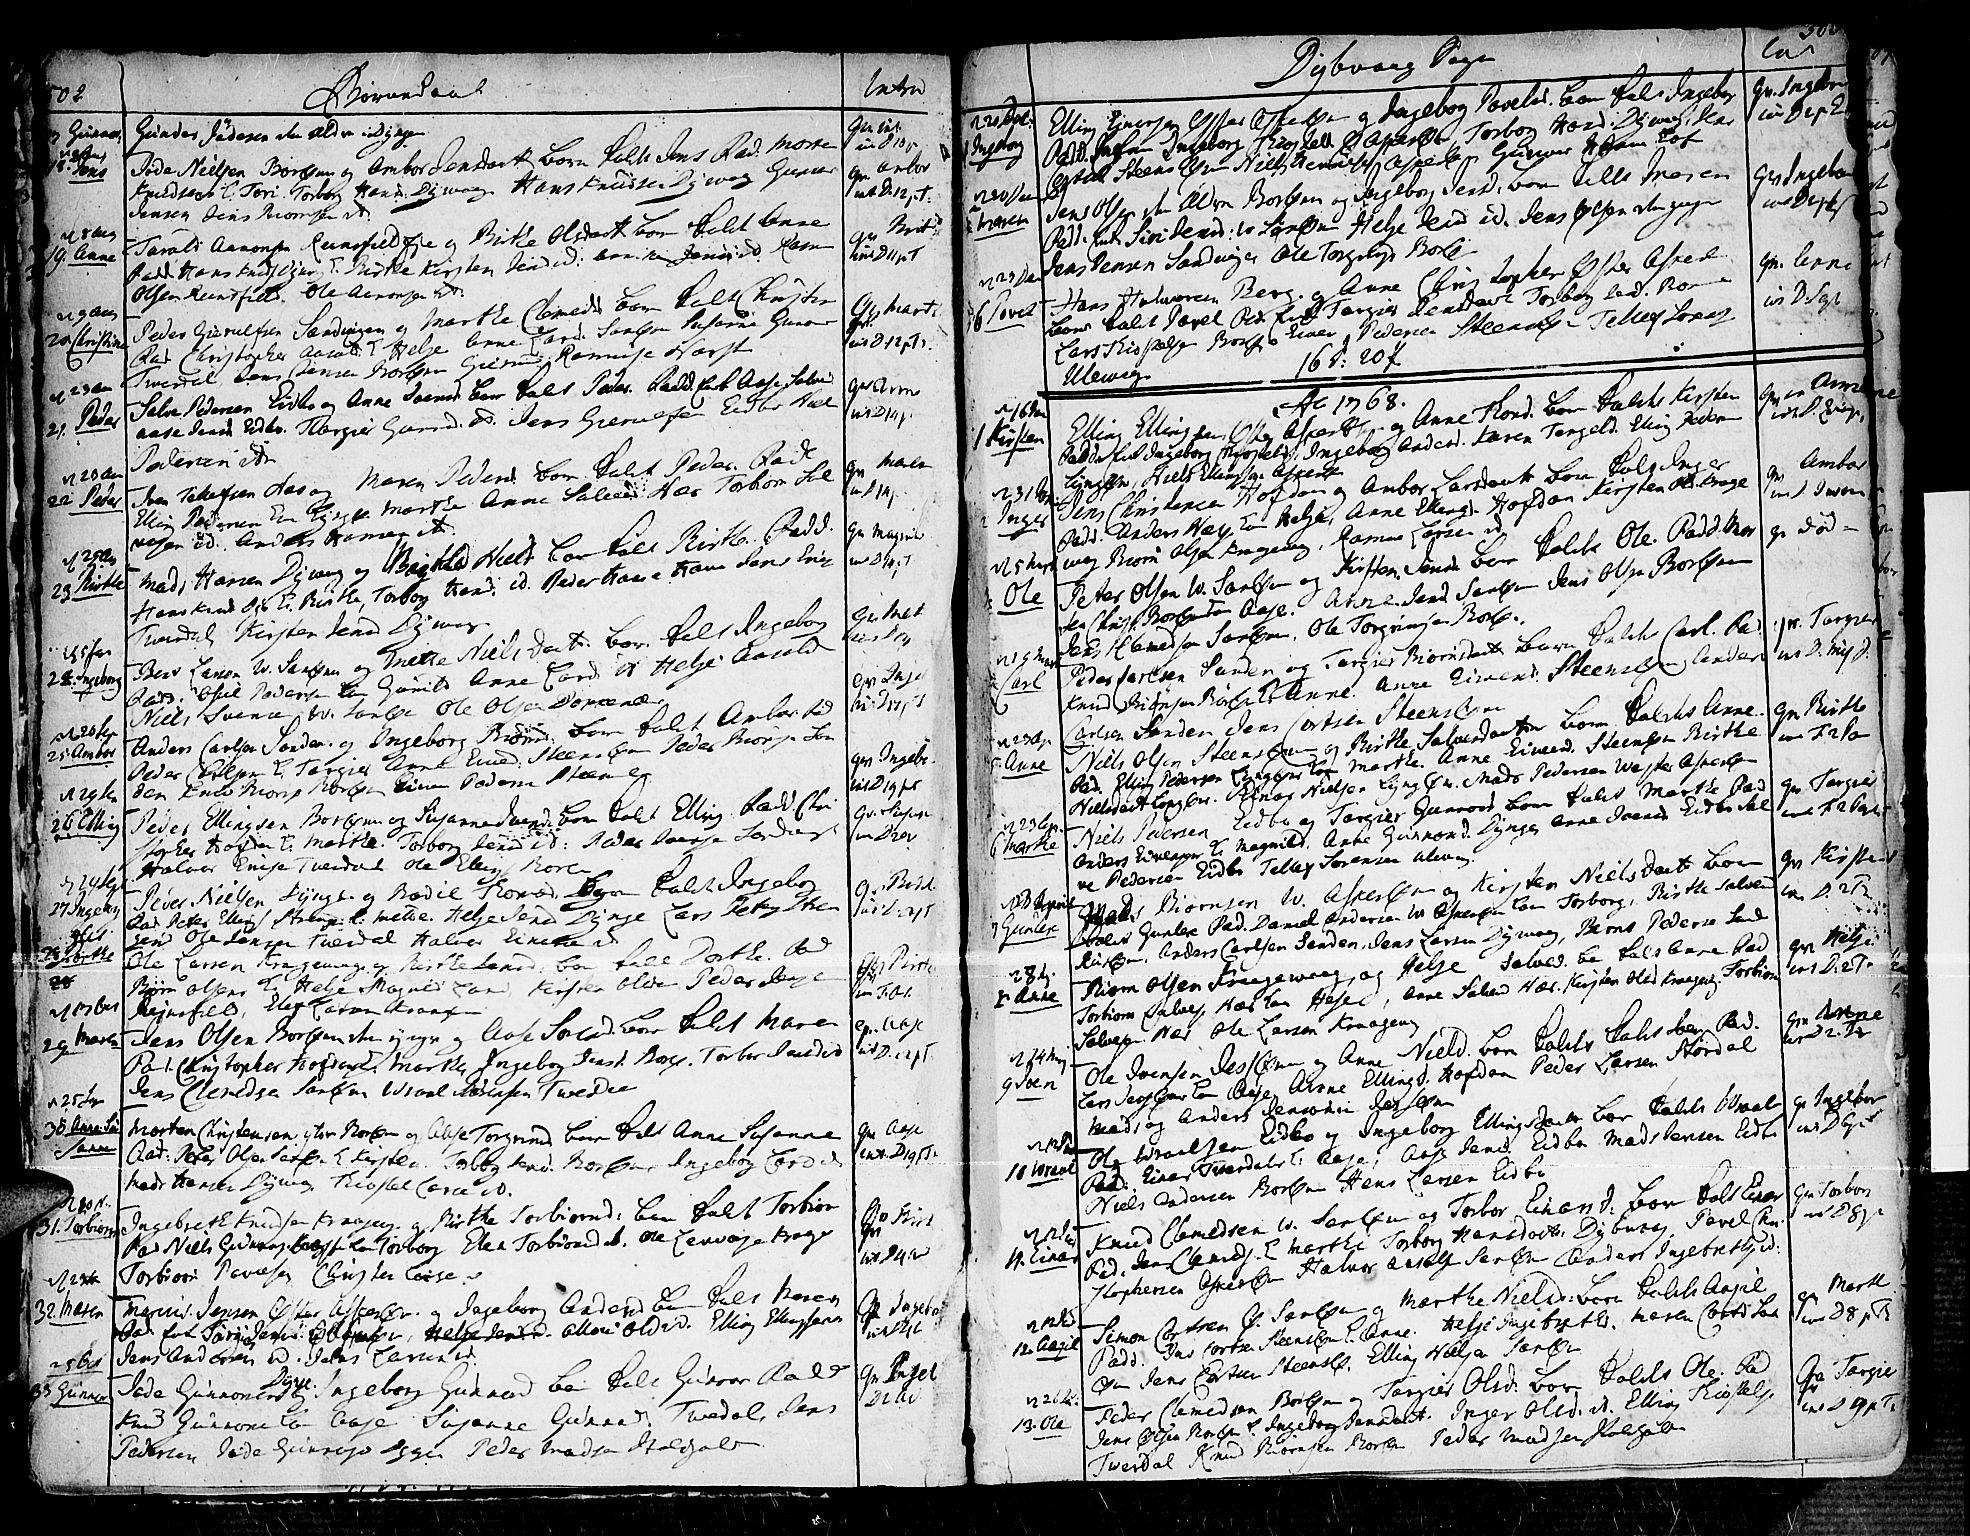 SAK, Dypvåg sokneprestkontor, F/Fa/Faa/L0001: Ministerialbok nr. A 1 /1, 1765-1798, s. 502-503